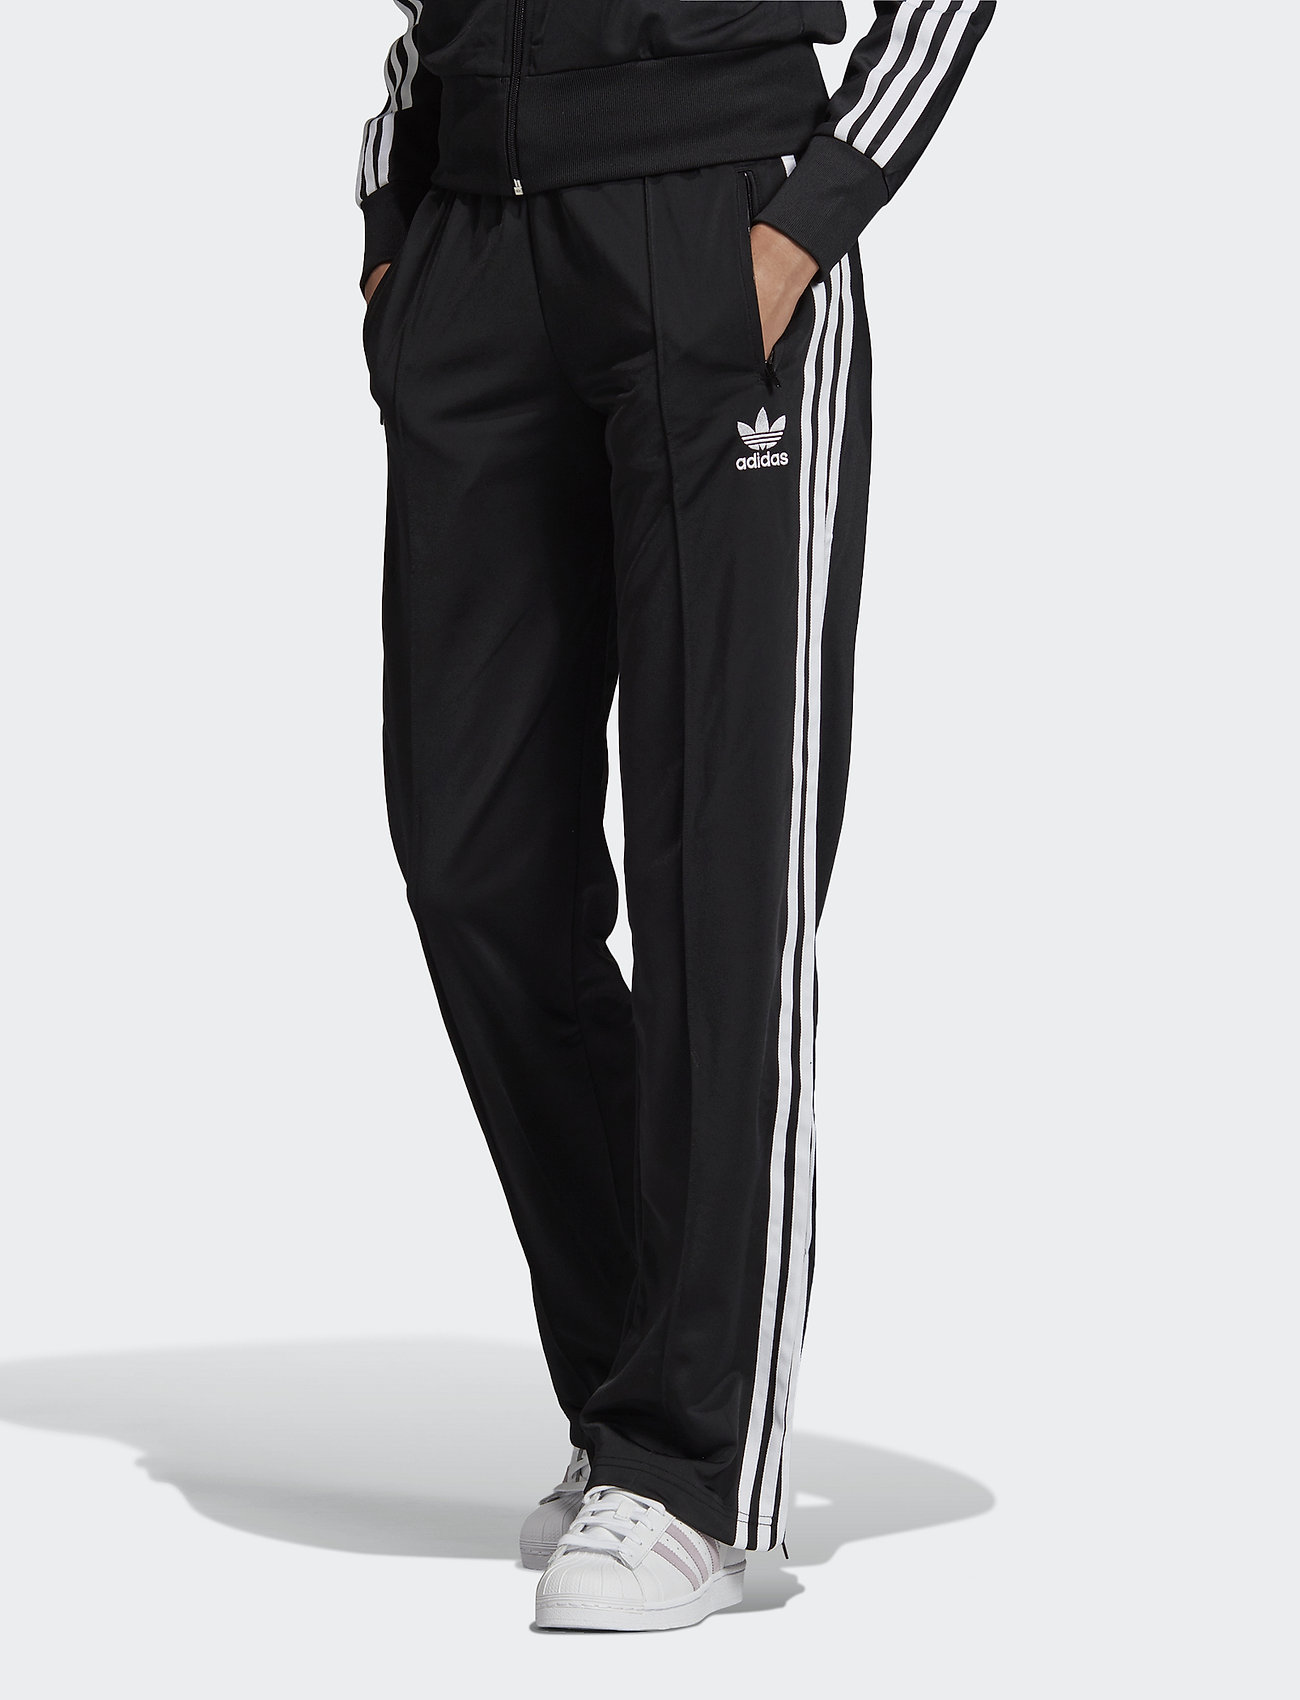 adidas Originals - FIREBIRD TP - pants - black - 0